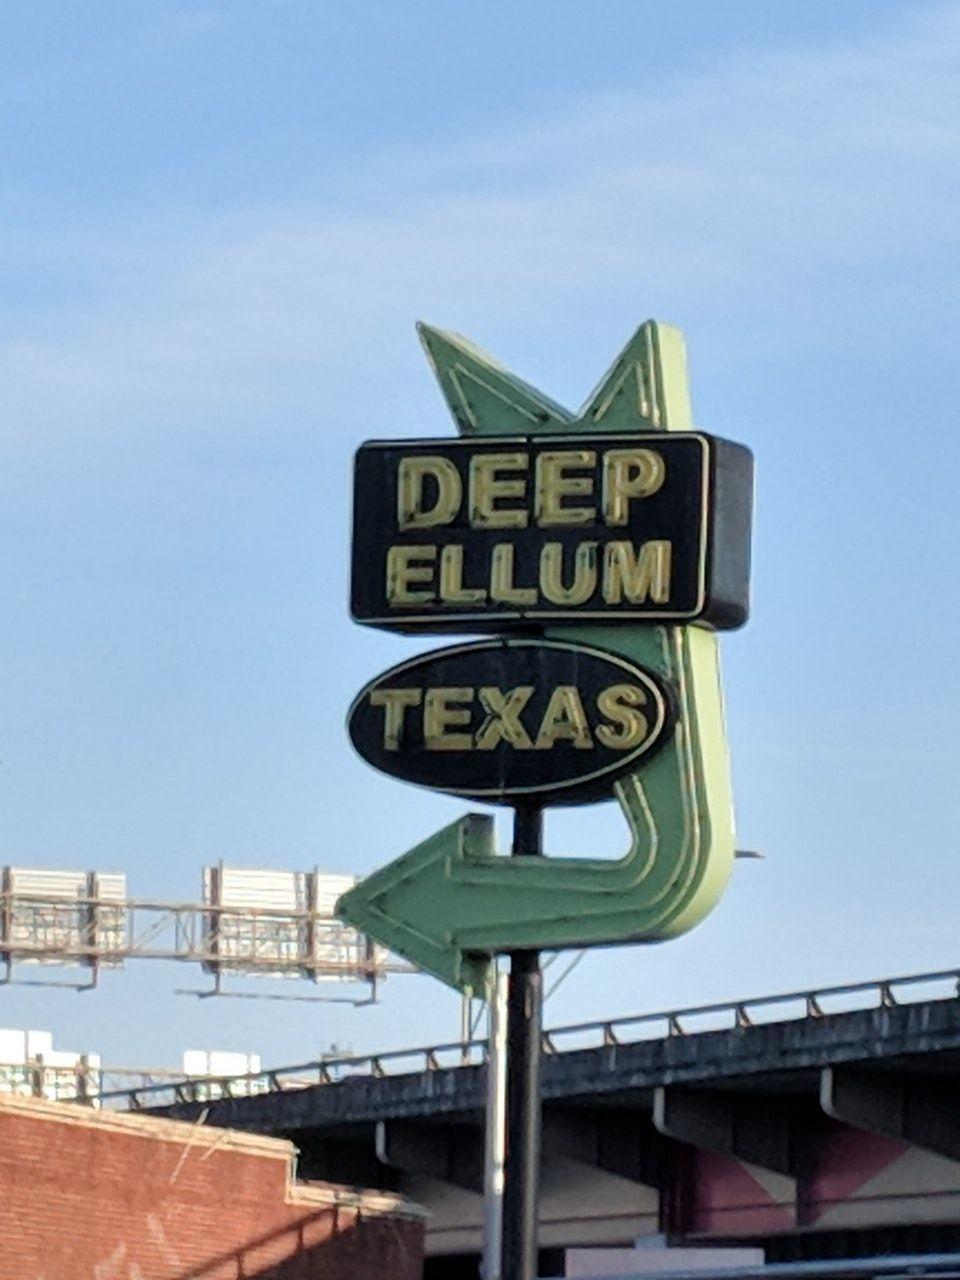 Deep ellum dallas tx ellum deep ellum dallas deep